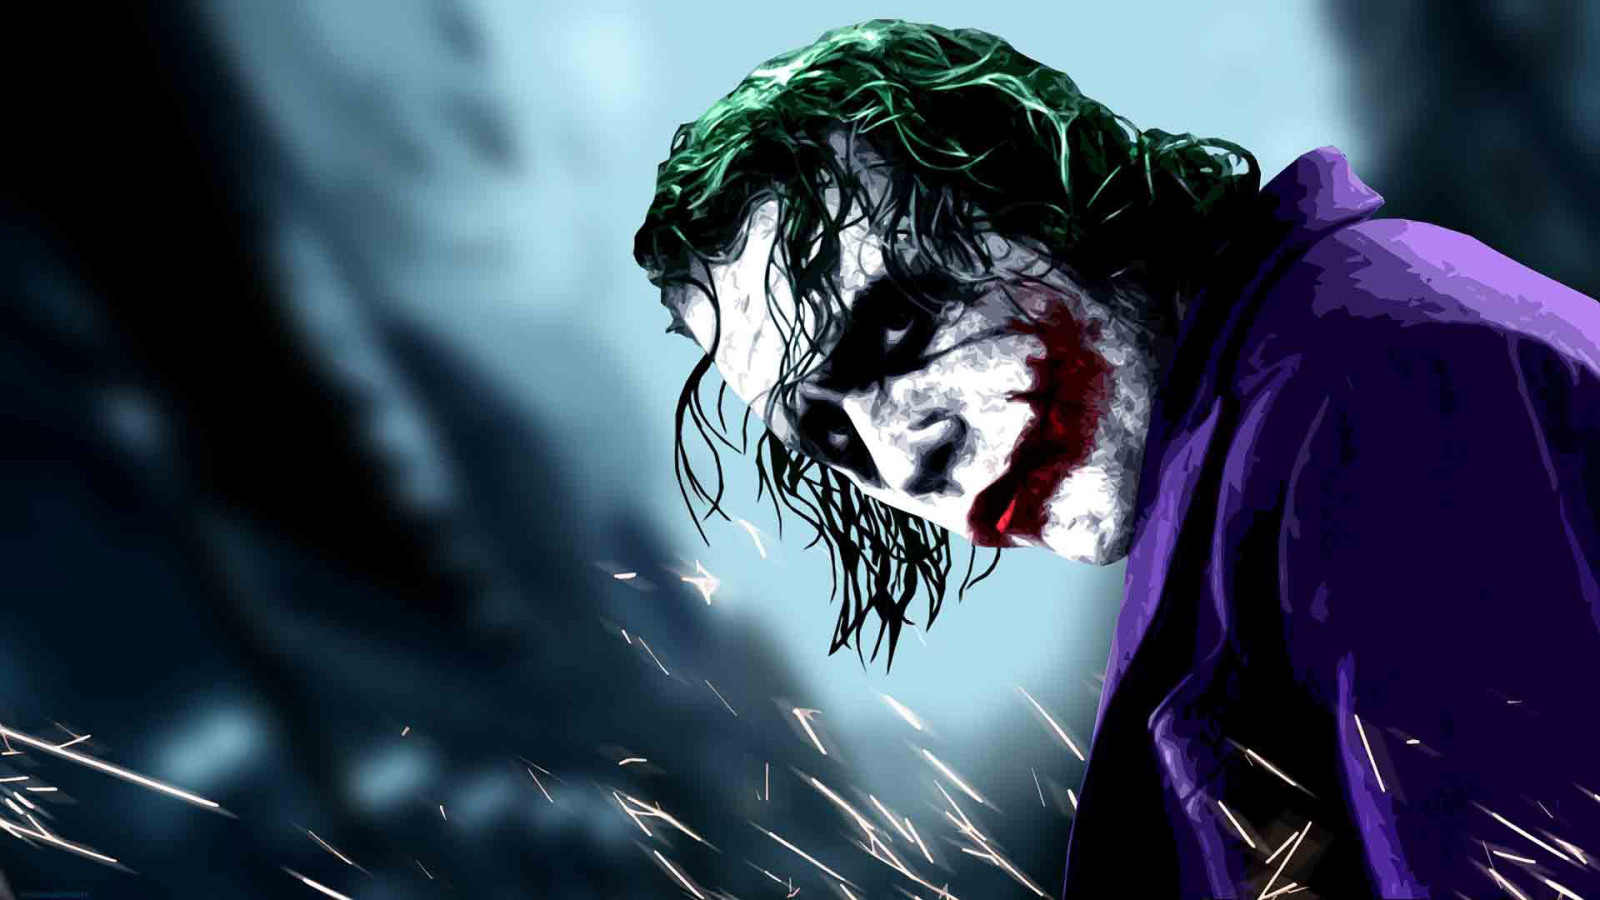 Heath Ledger Joker HD Wallpapers 1600x900